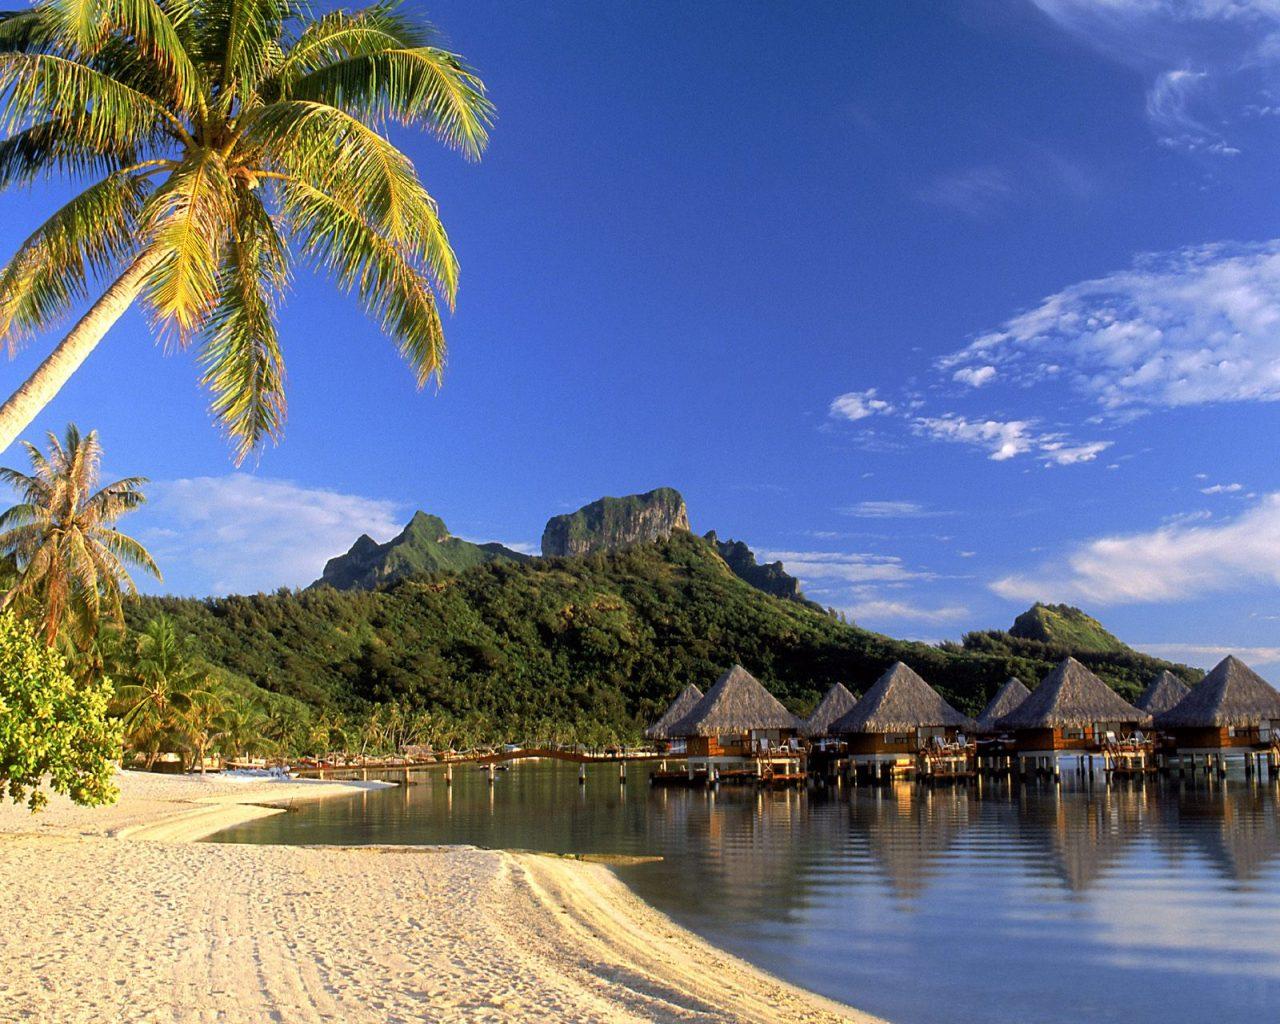 wallpaper de Playas de Bora Bora a 1280x1024 Fotos e imagenes de 1280x1024